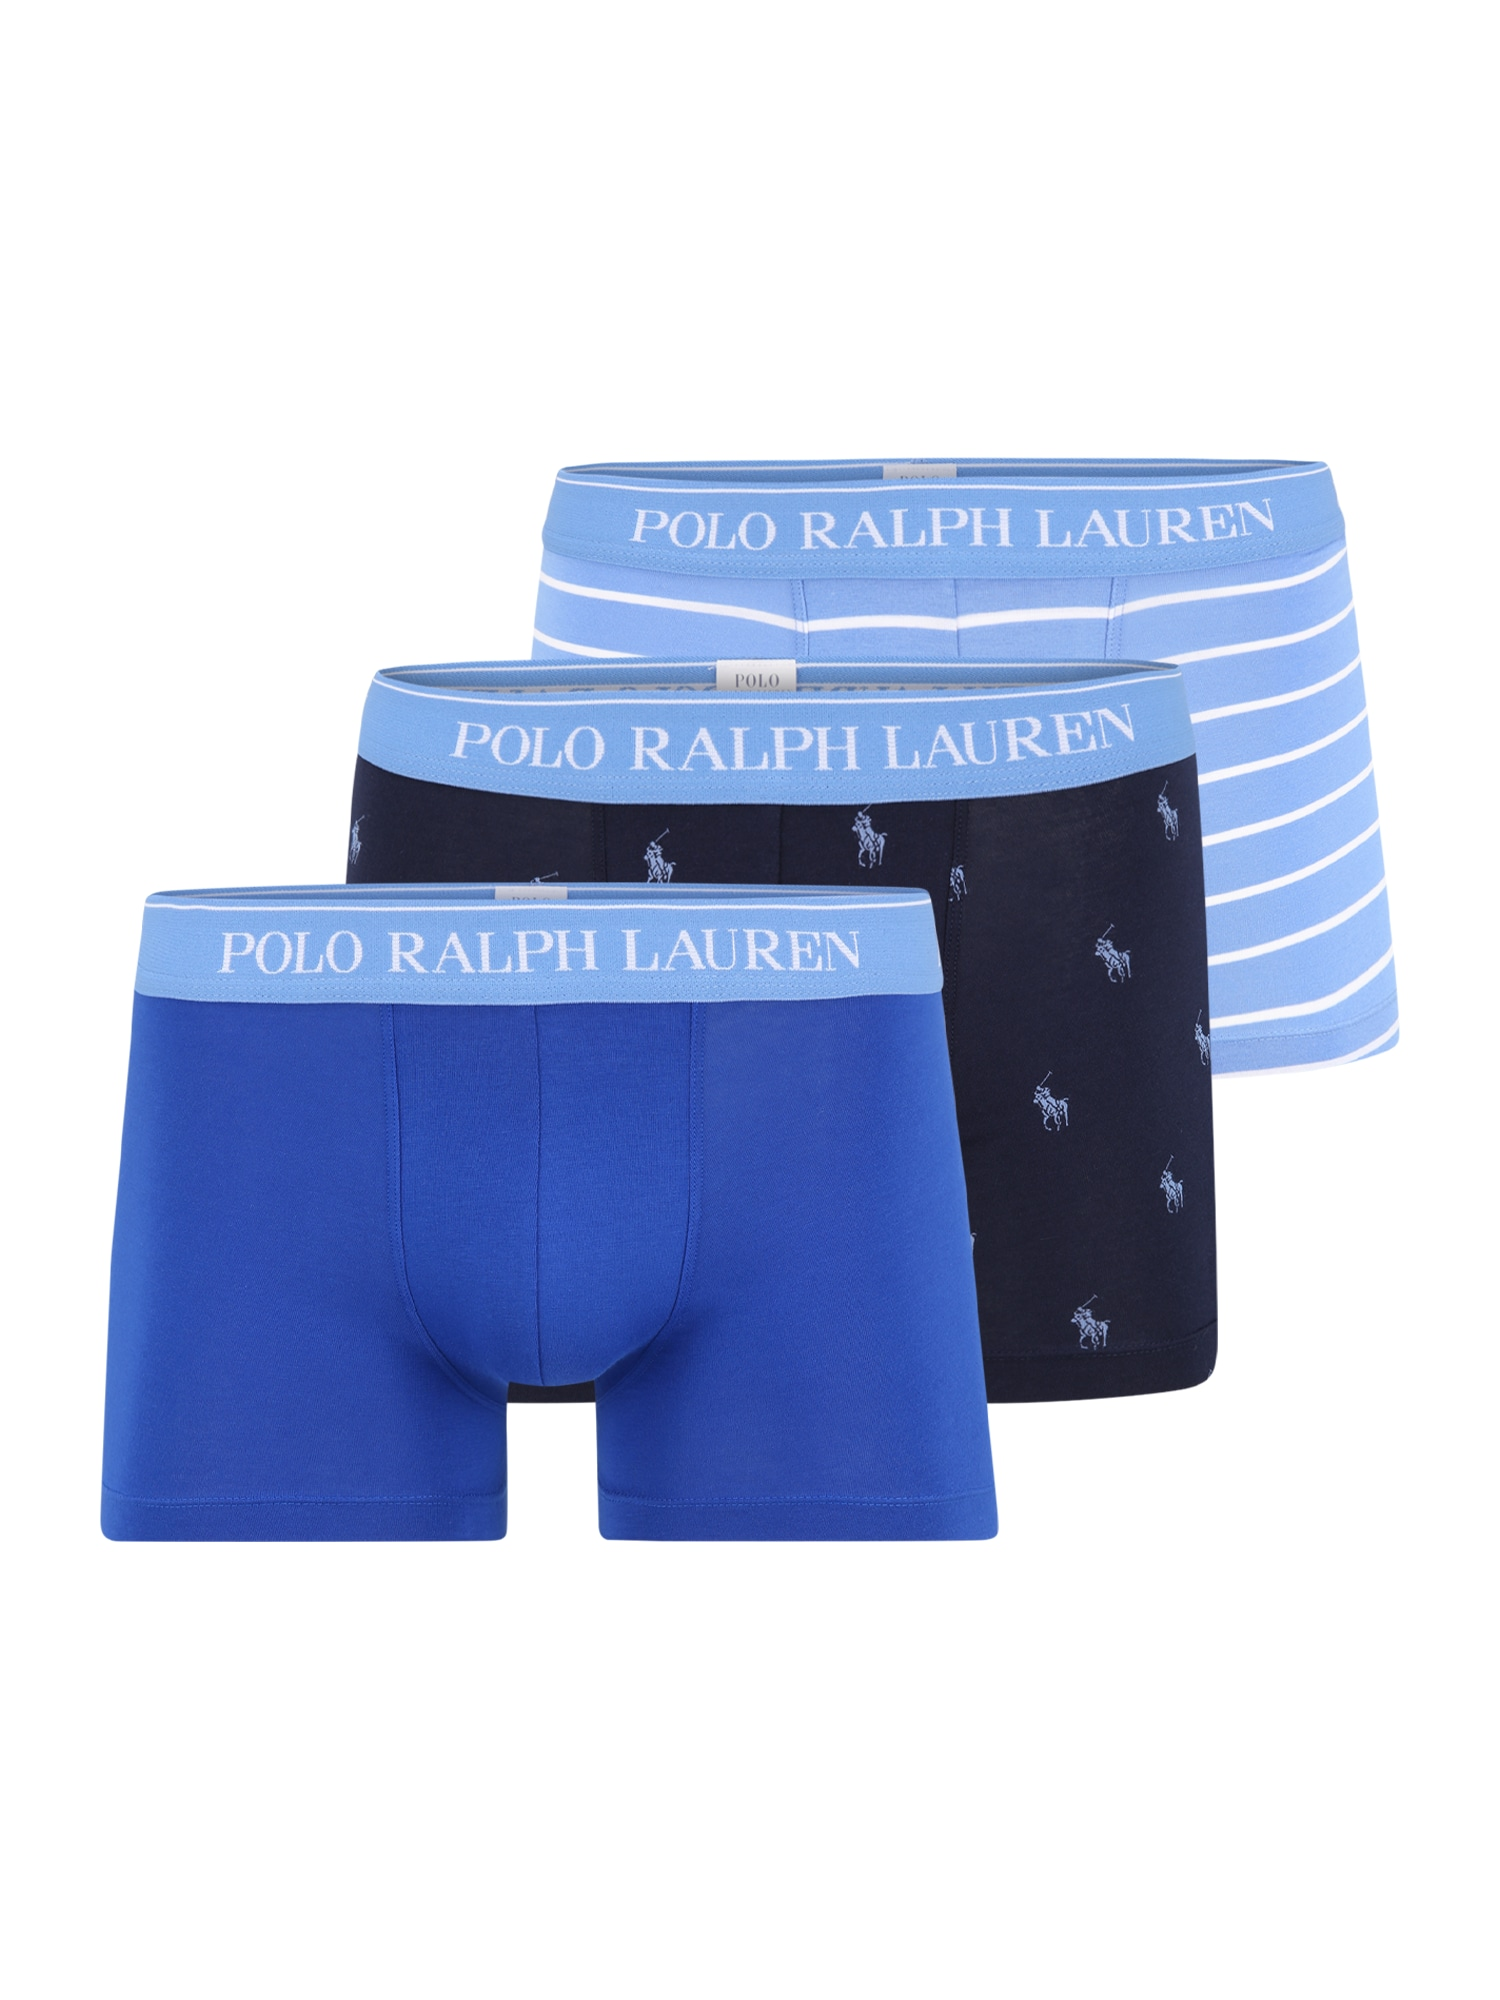 POLO RALPH LAUREN Boxer trumpikės mėlyna / balta / šviesiai mėlyna